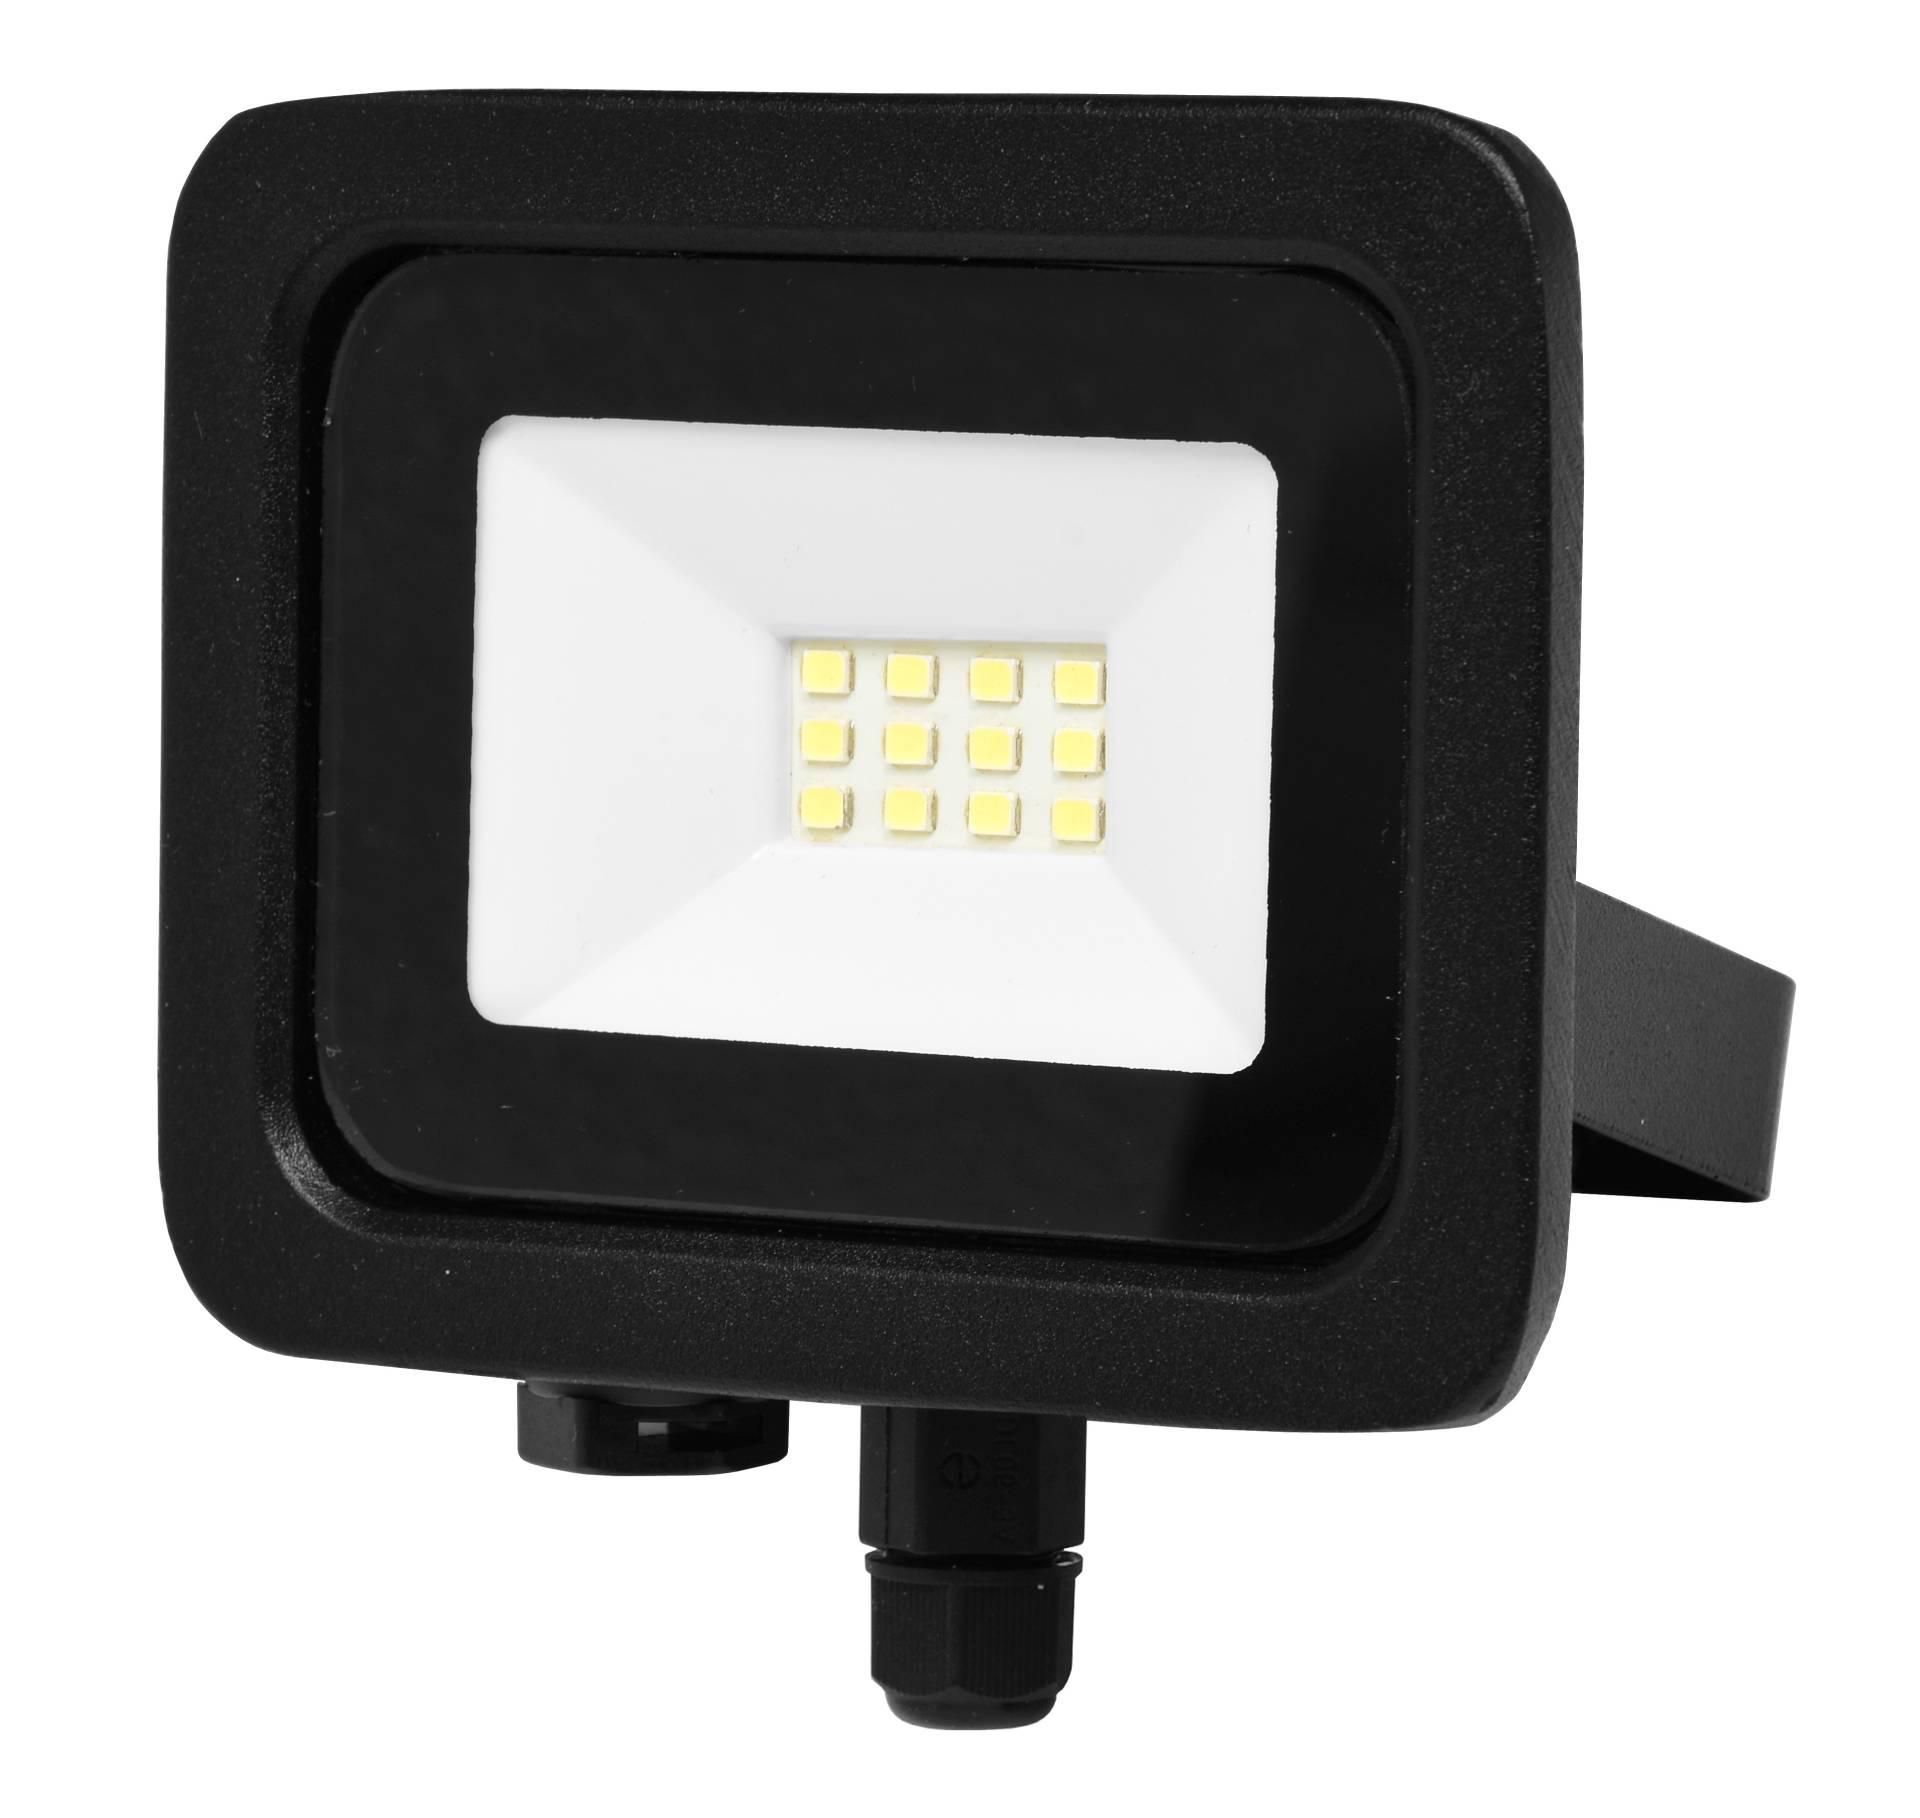 LED reflektor 10W RLED48WL-10W/5000K